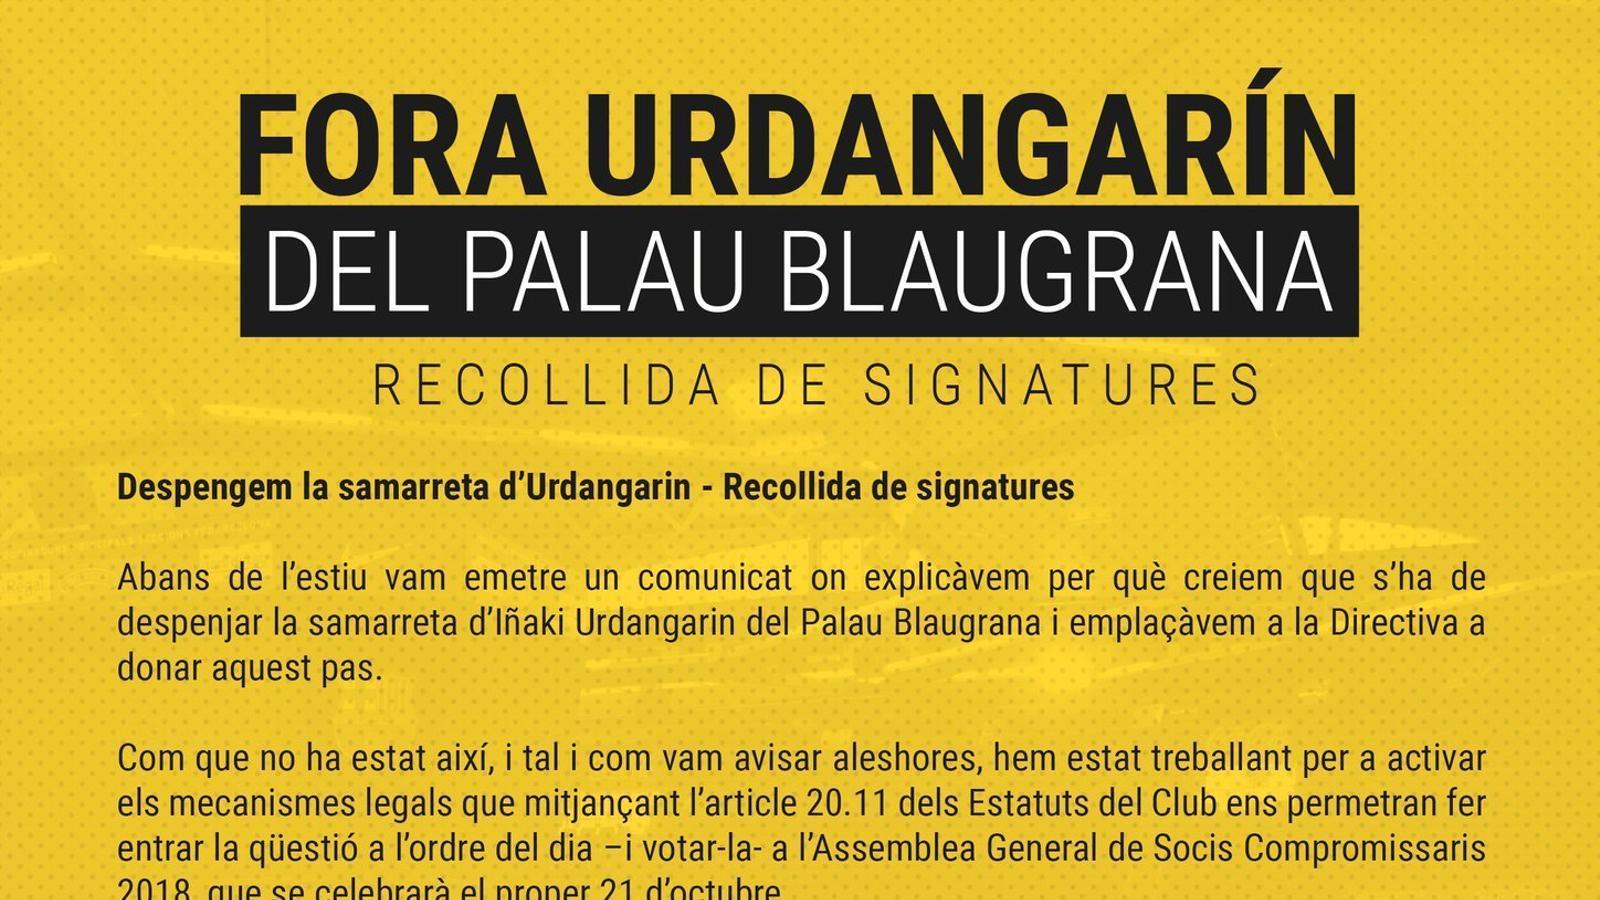 Campanya per retirar la samarreta d'Urdangarin del Palau